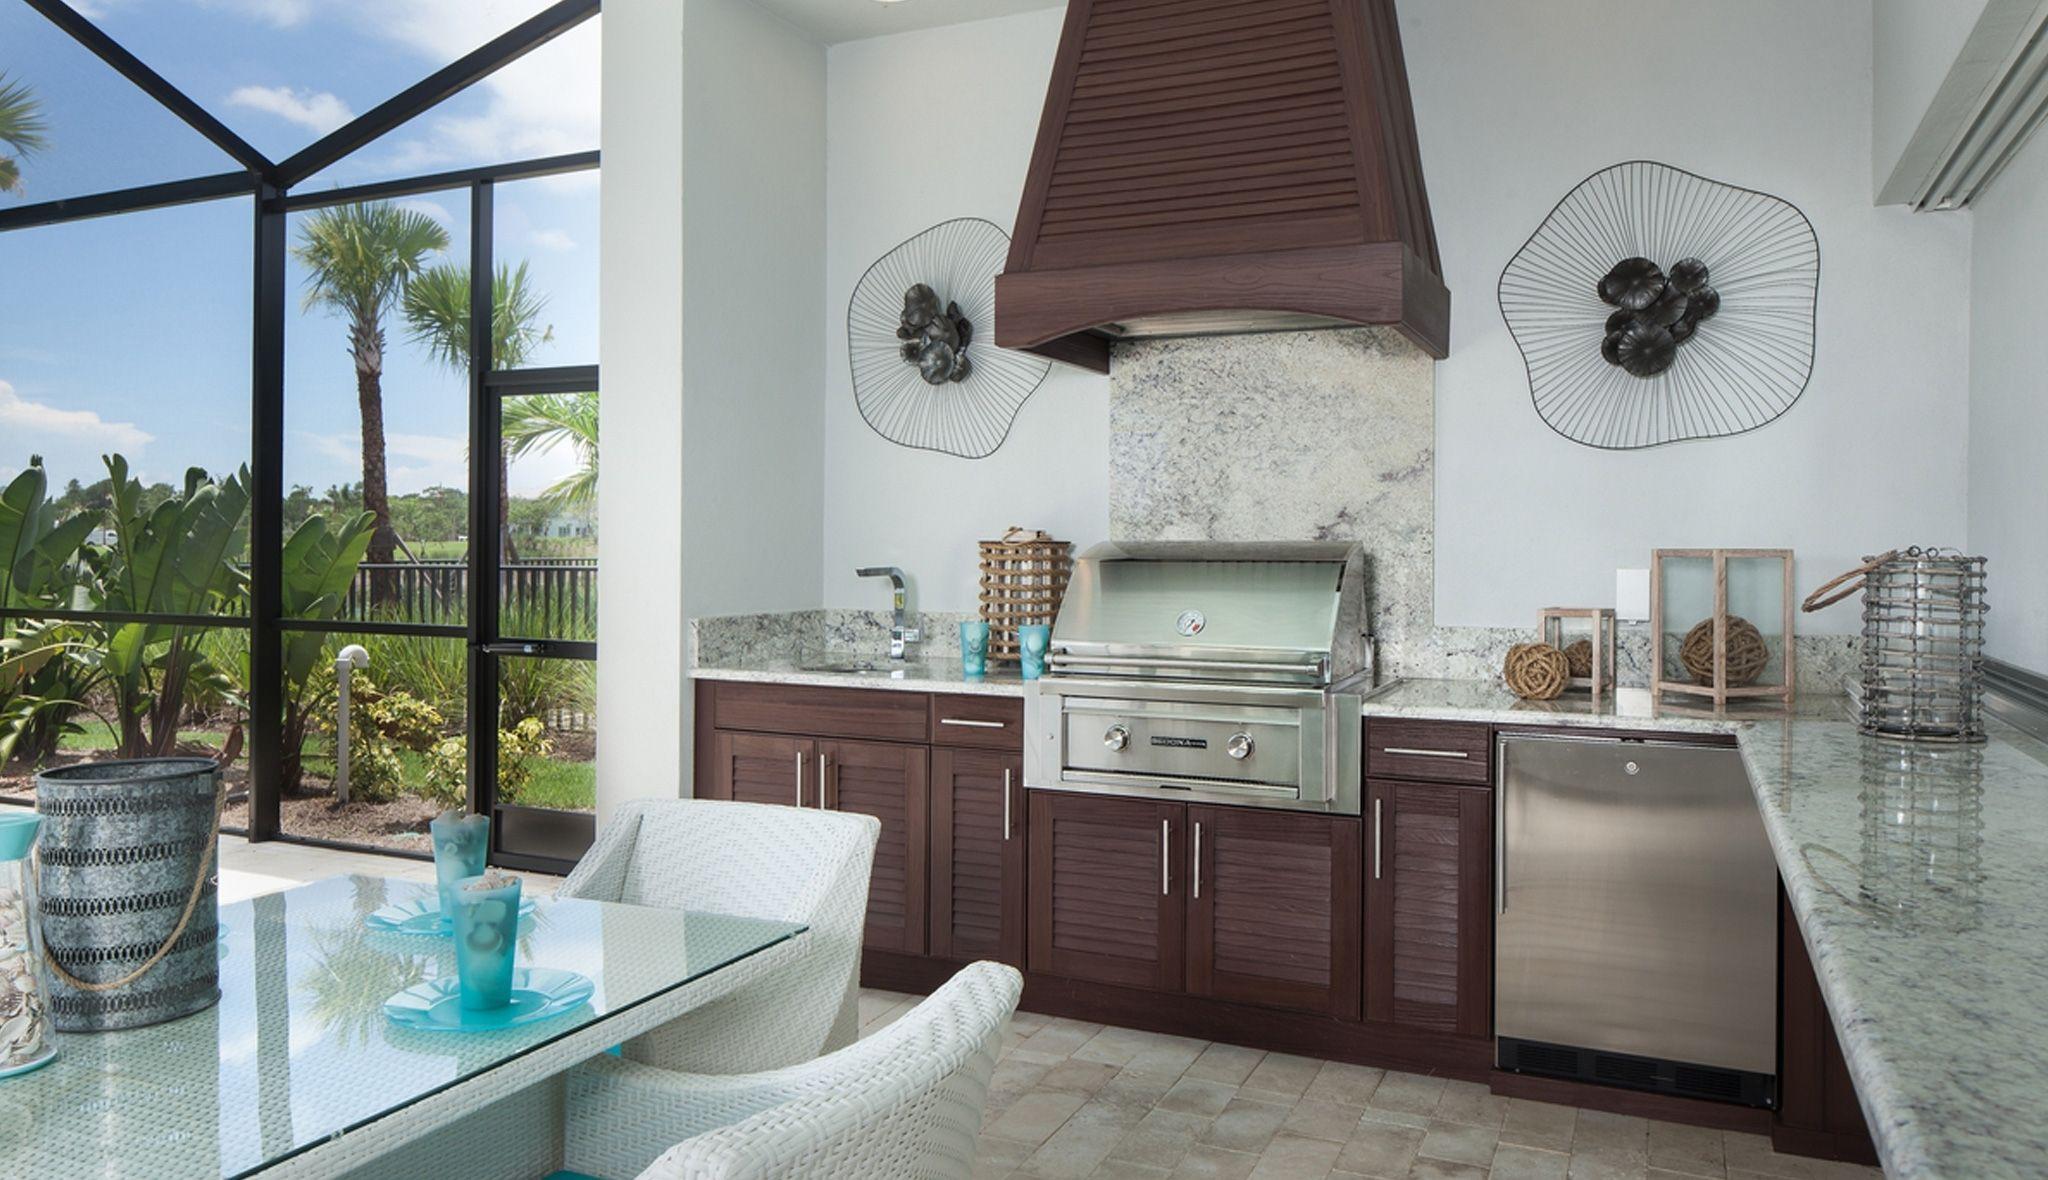 outdoor kitchen distributors denver - interior paint colors for 2017 ...